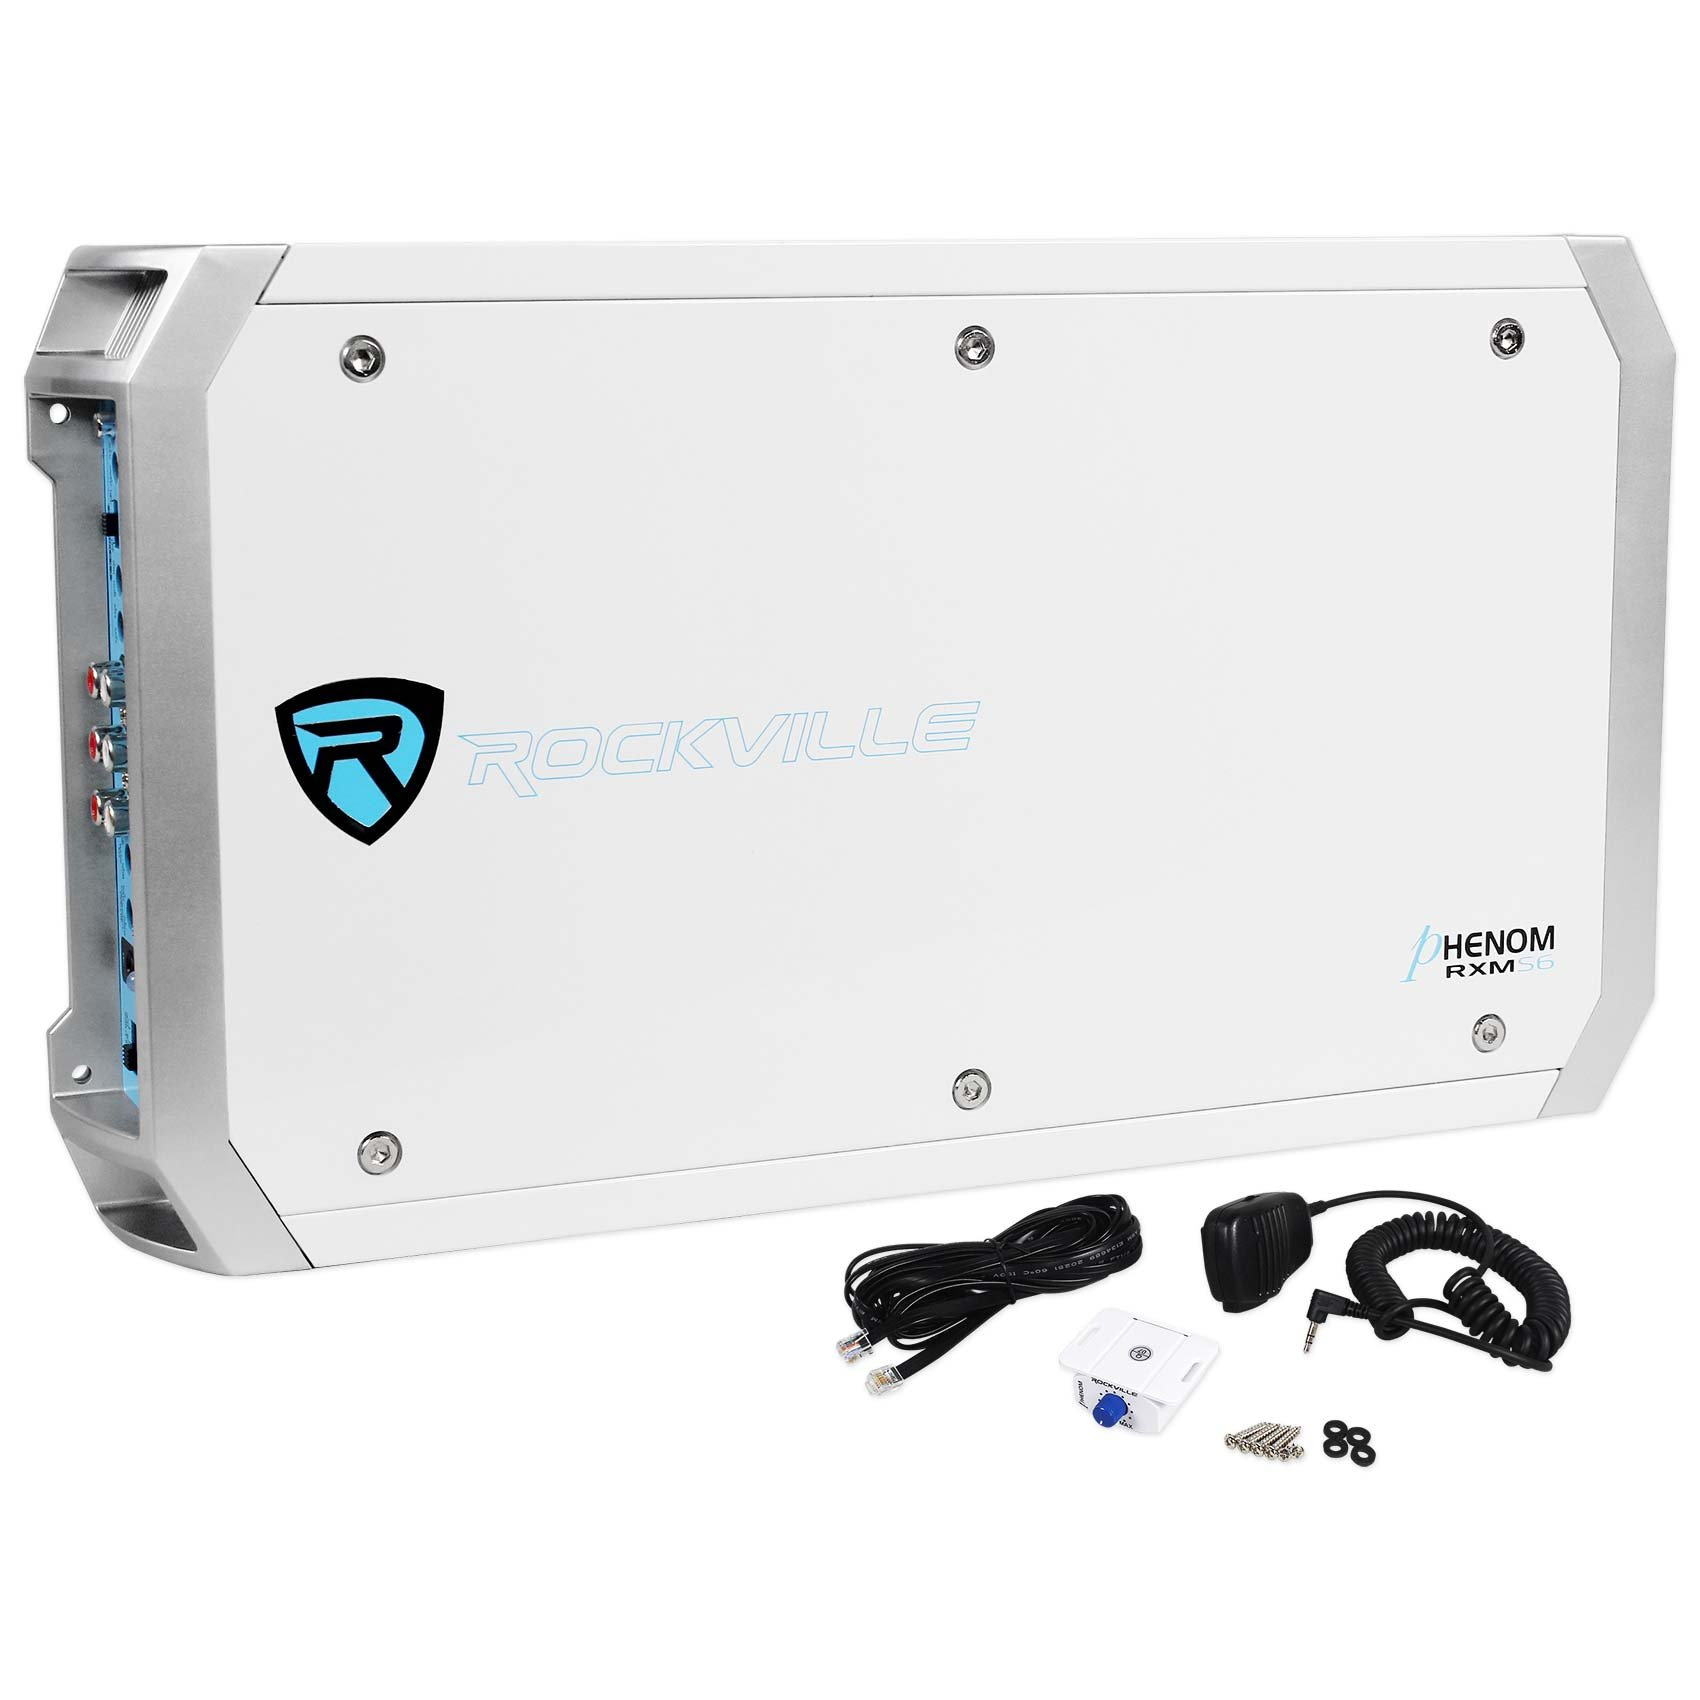 Rockville RXM S6 Marine Channel Amplifier